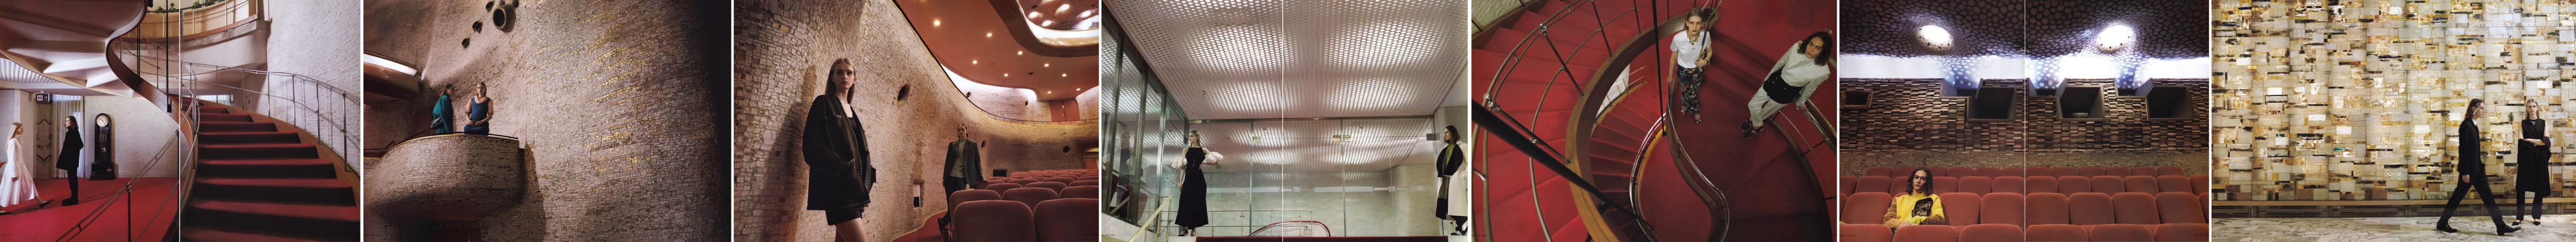 Casa BRUTUS_Fashion special 2021 SS_Nissay-Theatre